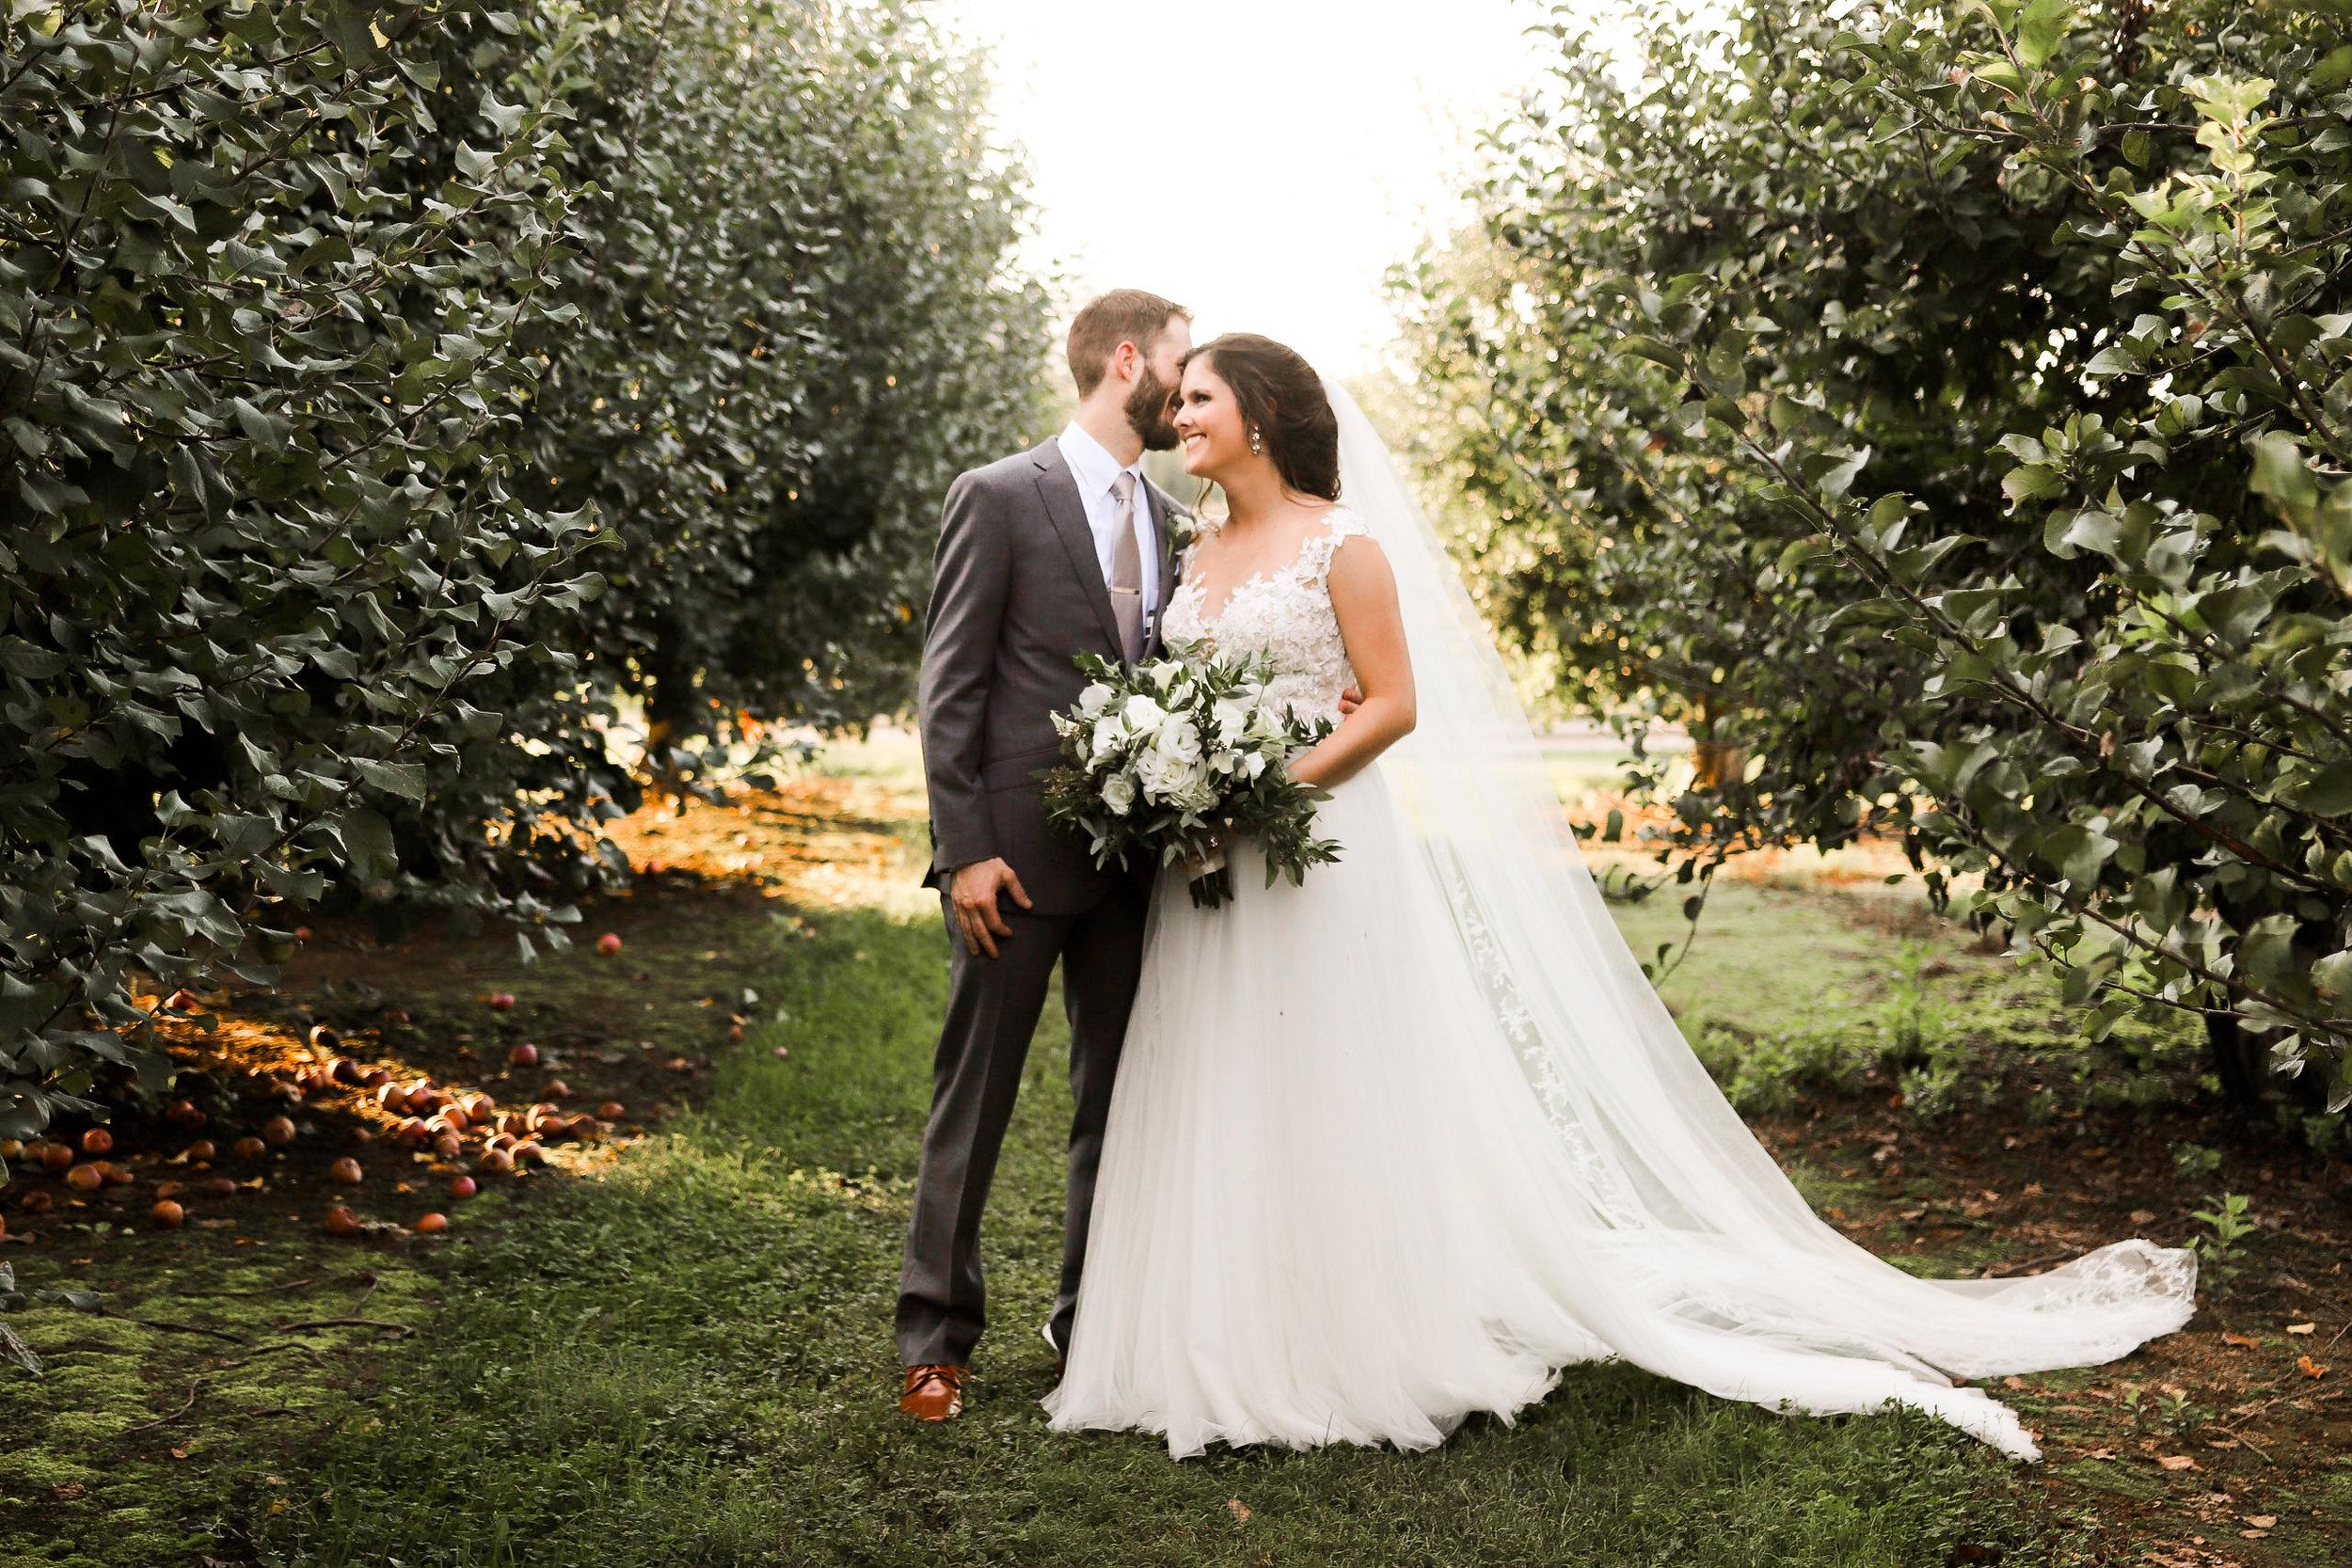 Evans-Orchard-Lexington-Kentucky-Fall-Wedding-22.jpg